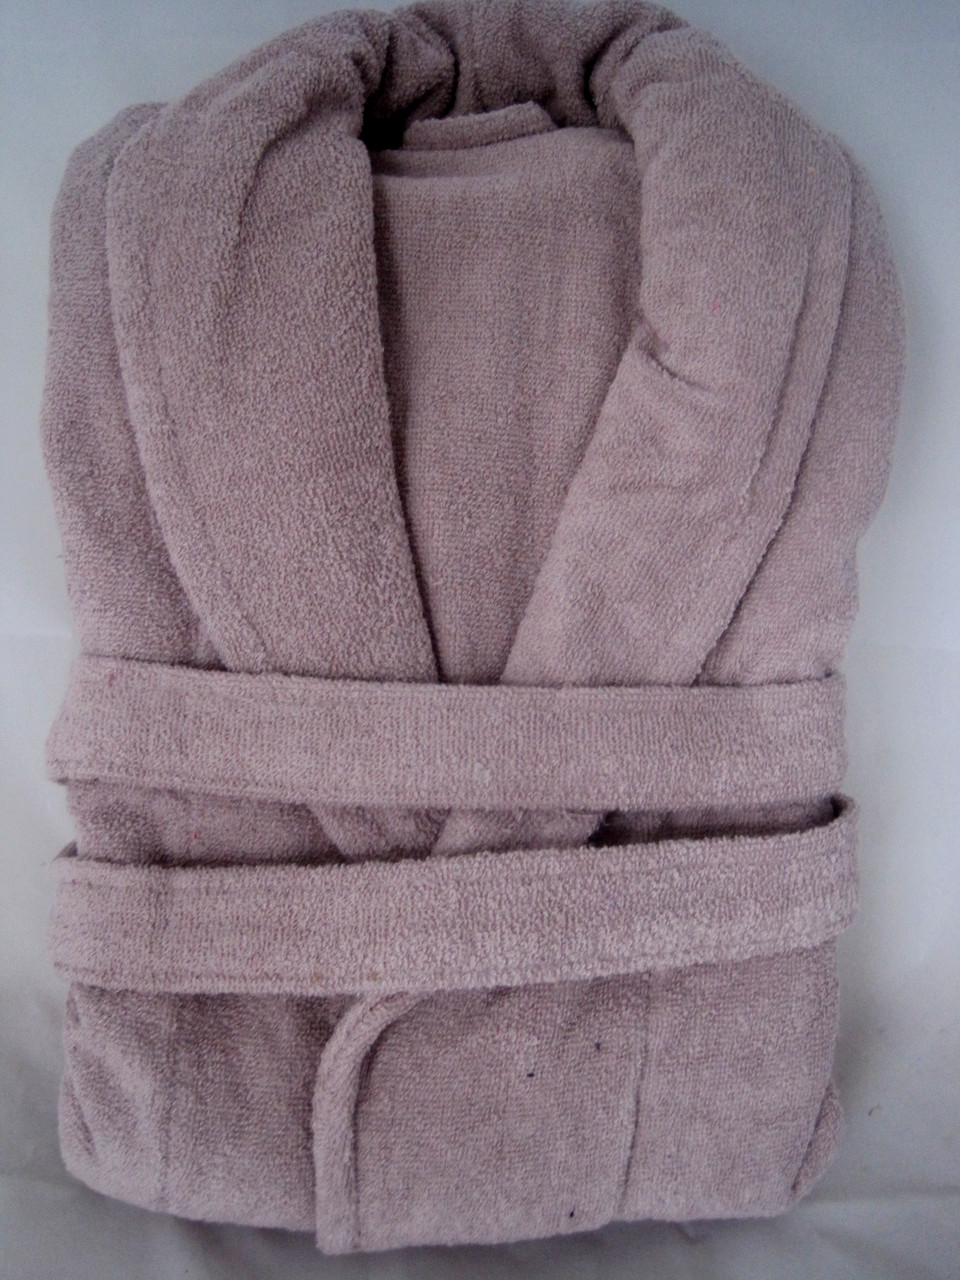 Махровый халат 100 % хлопок размер 46-48